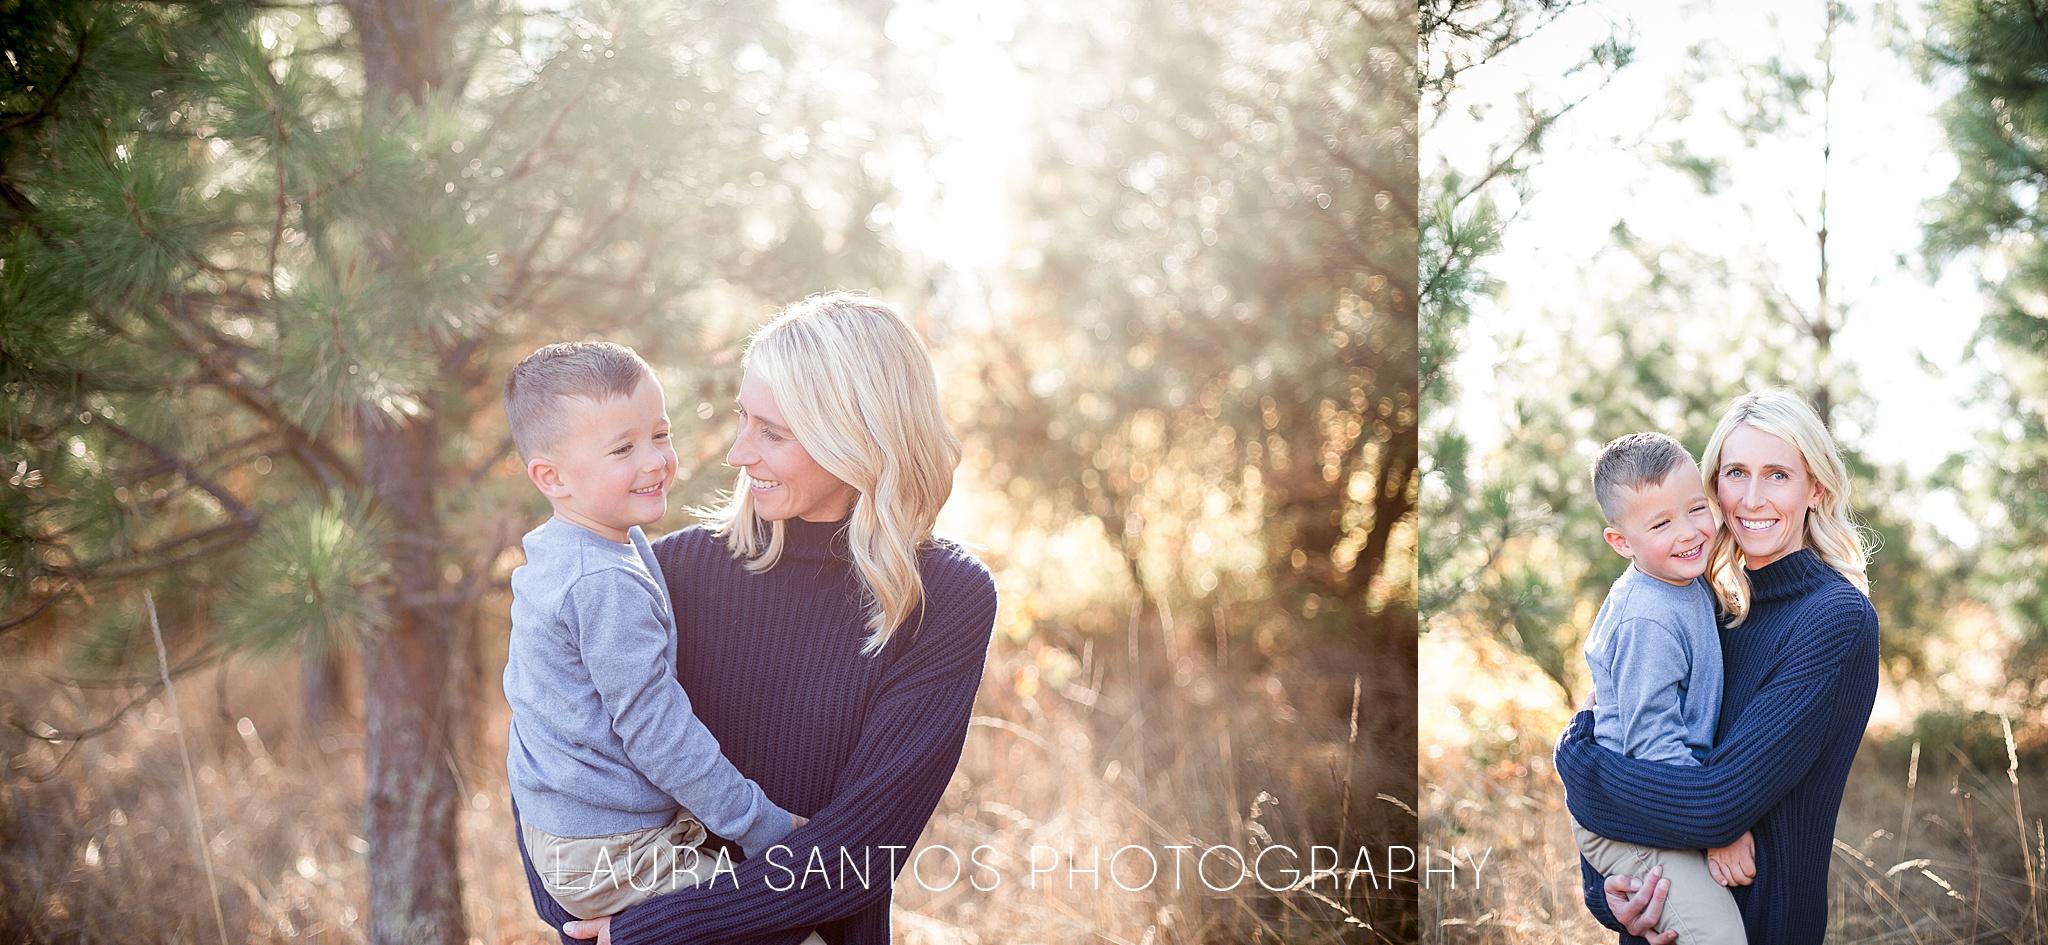 Laura Santos Photography Portland Oregon Family Photographer_0821.jpg